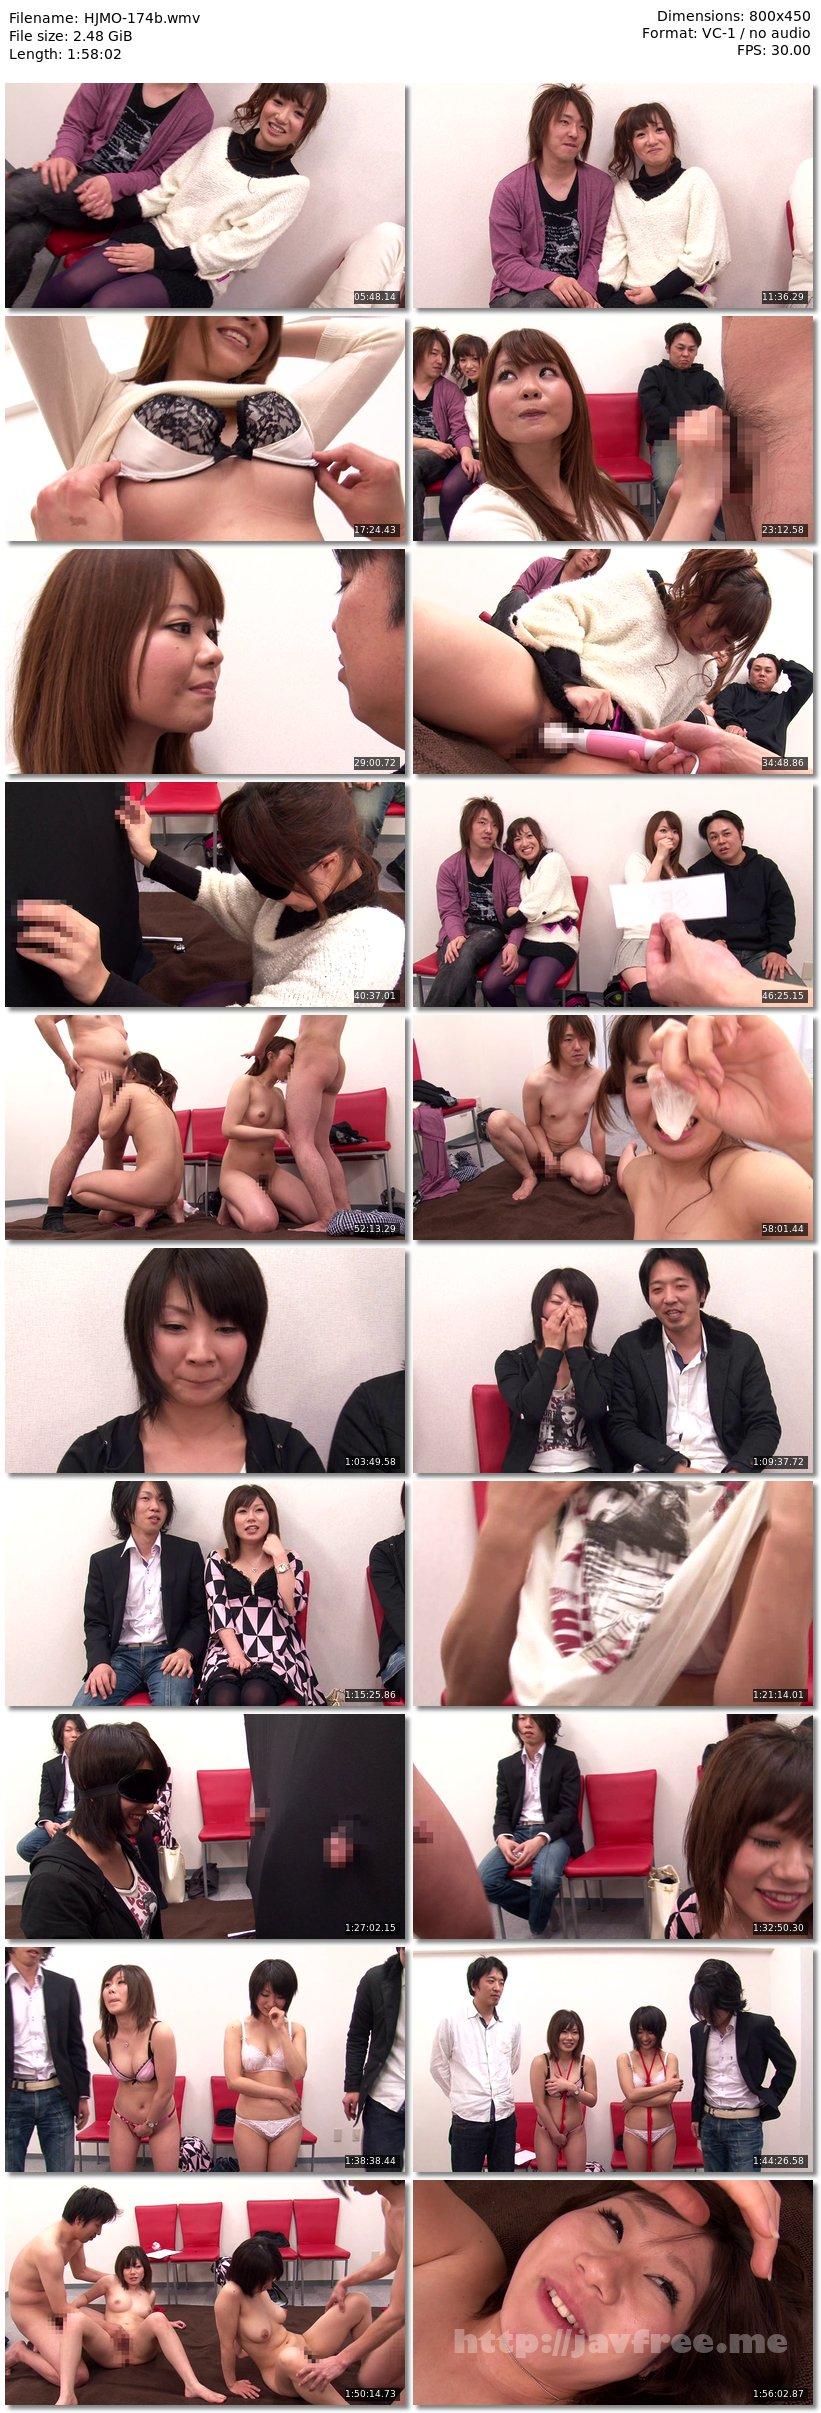 [HJMO-174] カップルの彼氏・彼女をムリヤリ入れ替え!強●スワッピングゲーム!!3